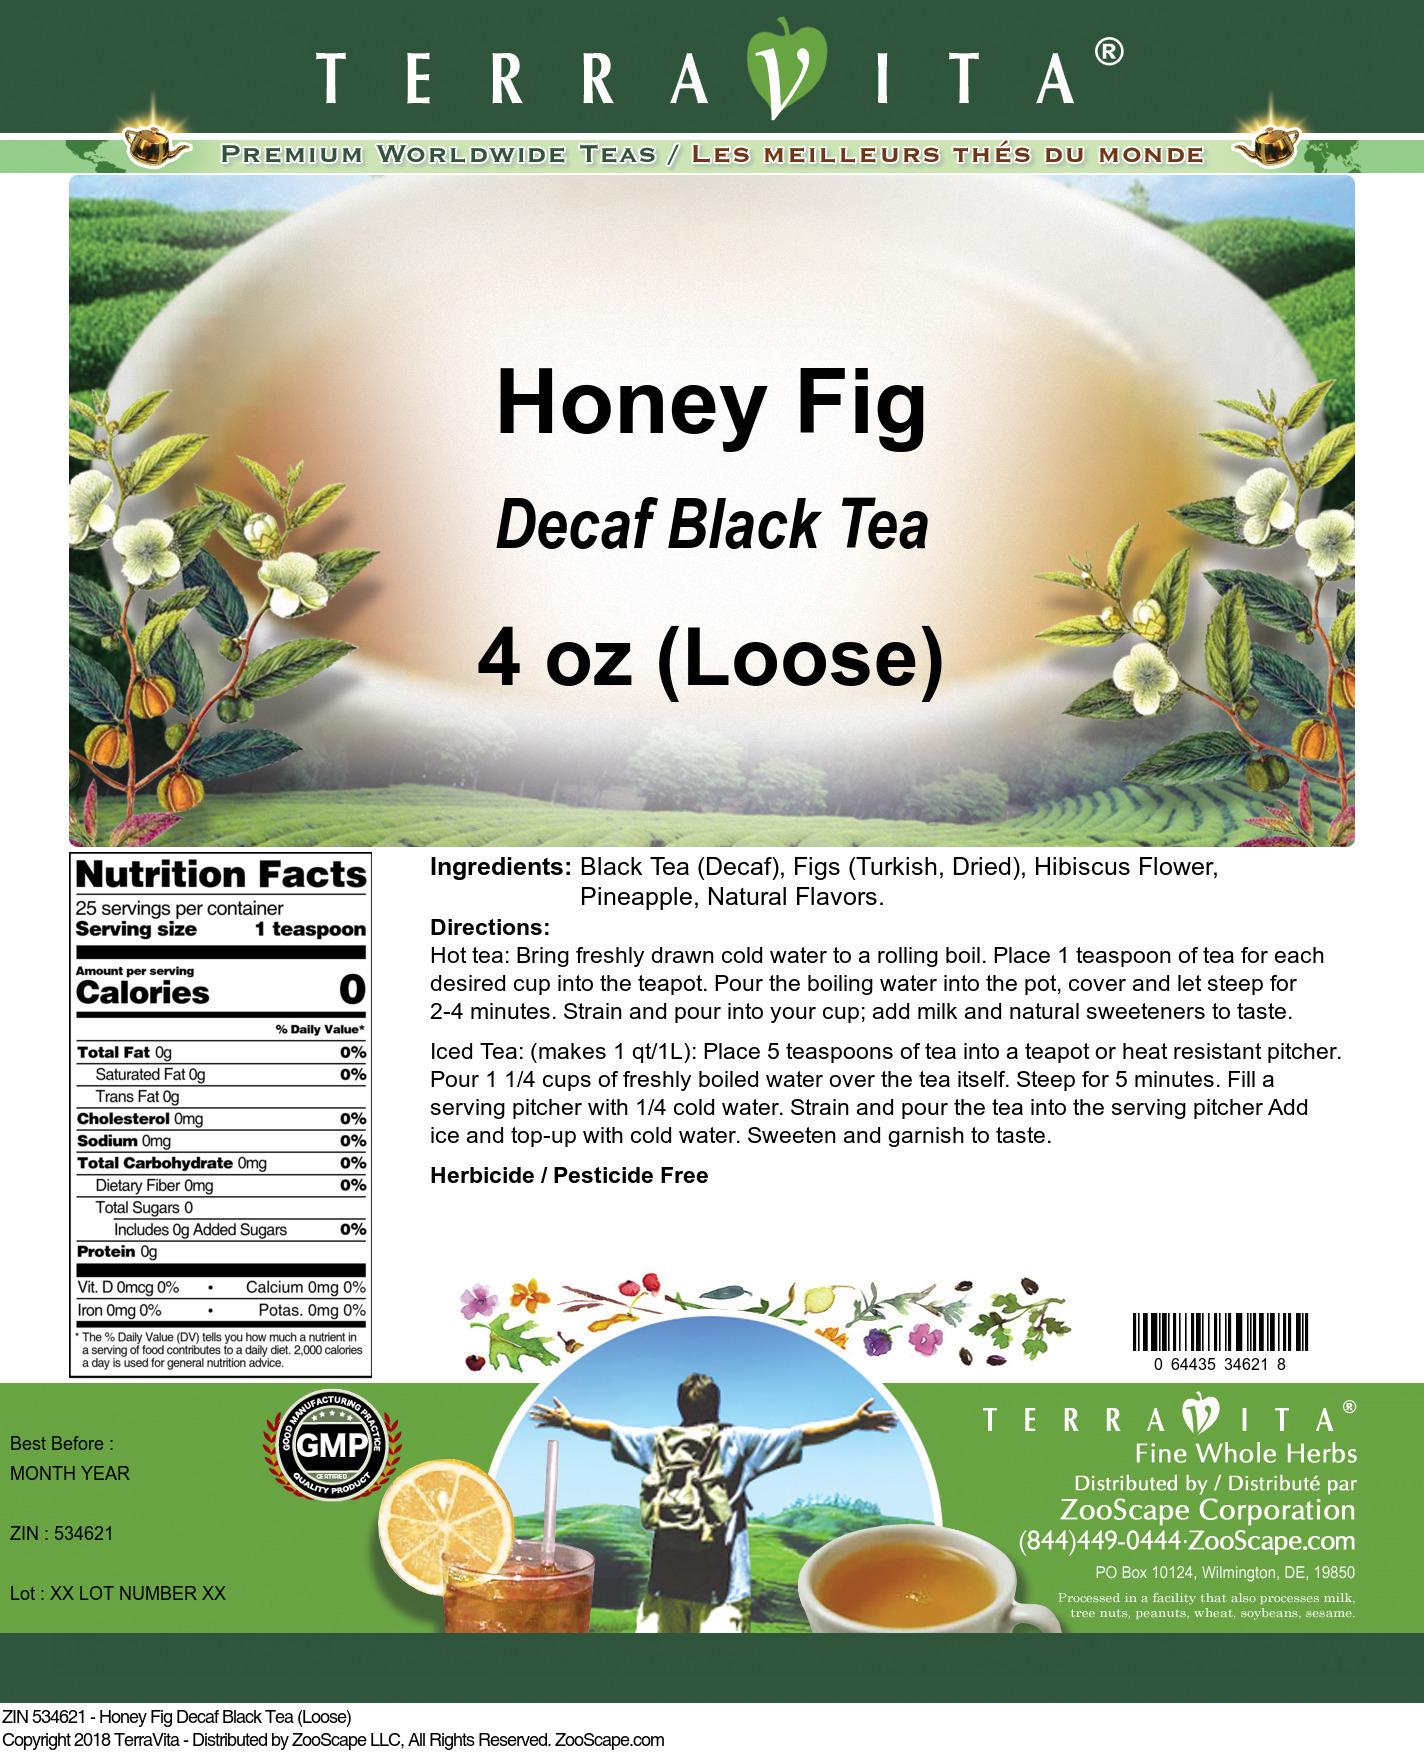 Honey Fig Decaf Black Tea (Loose)